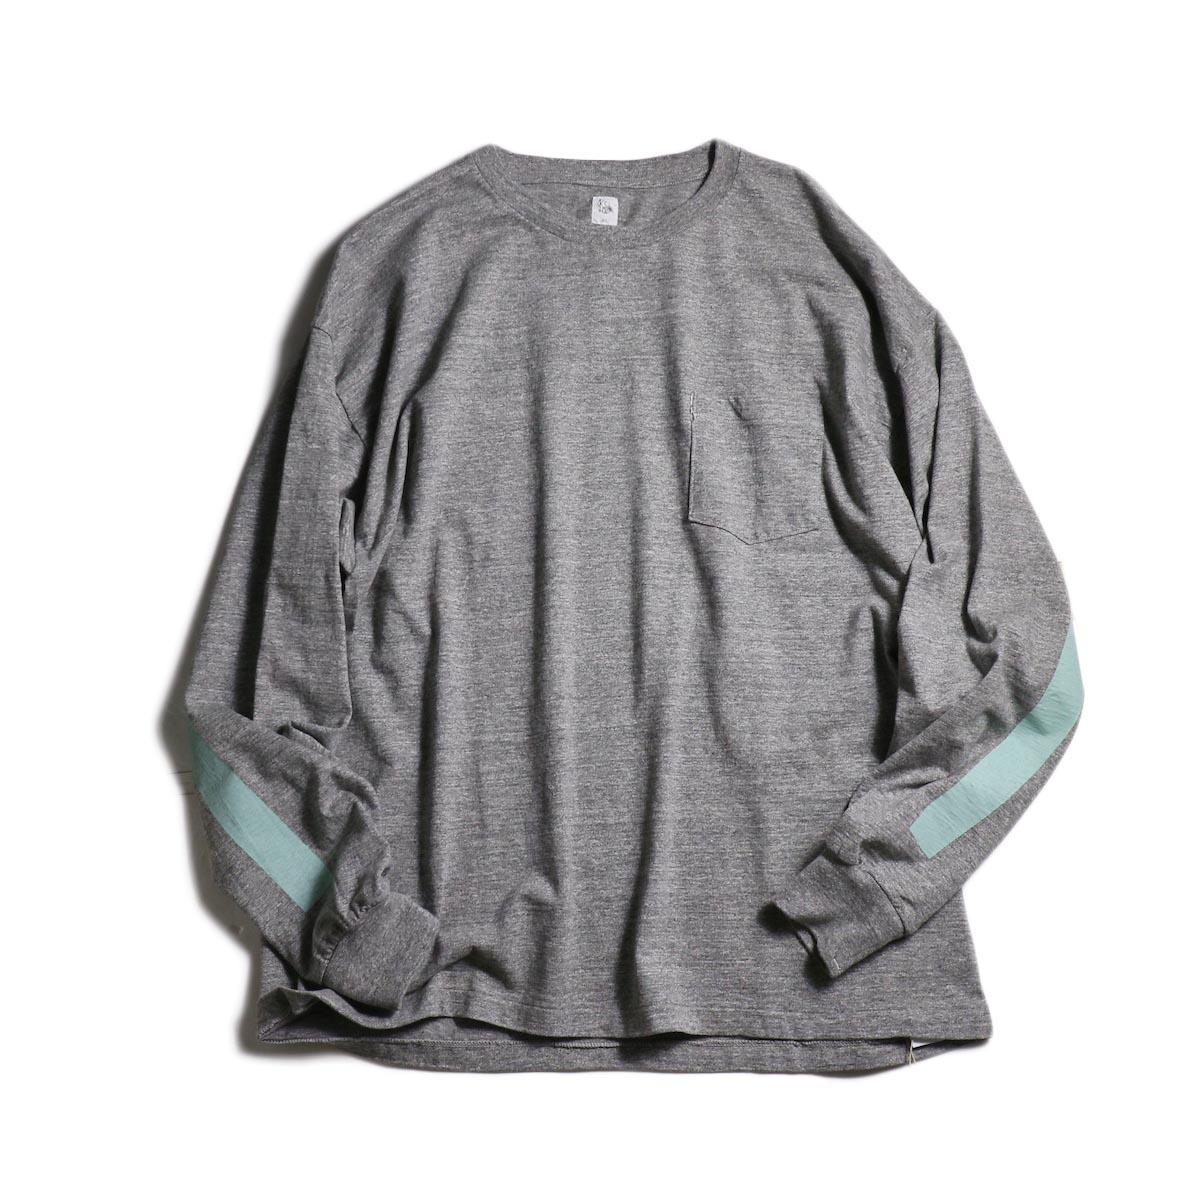 Kaptain Sunshine / West Coast Long Sleeve Tee (Feather Gray×Mint Green Line)